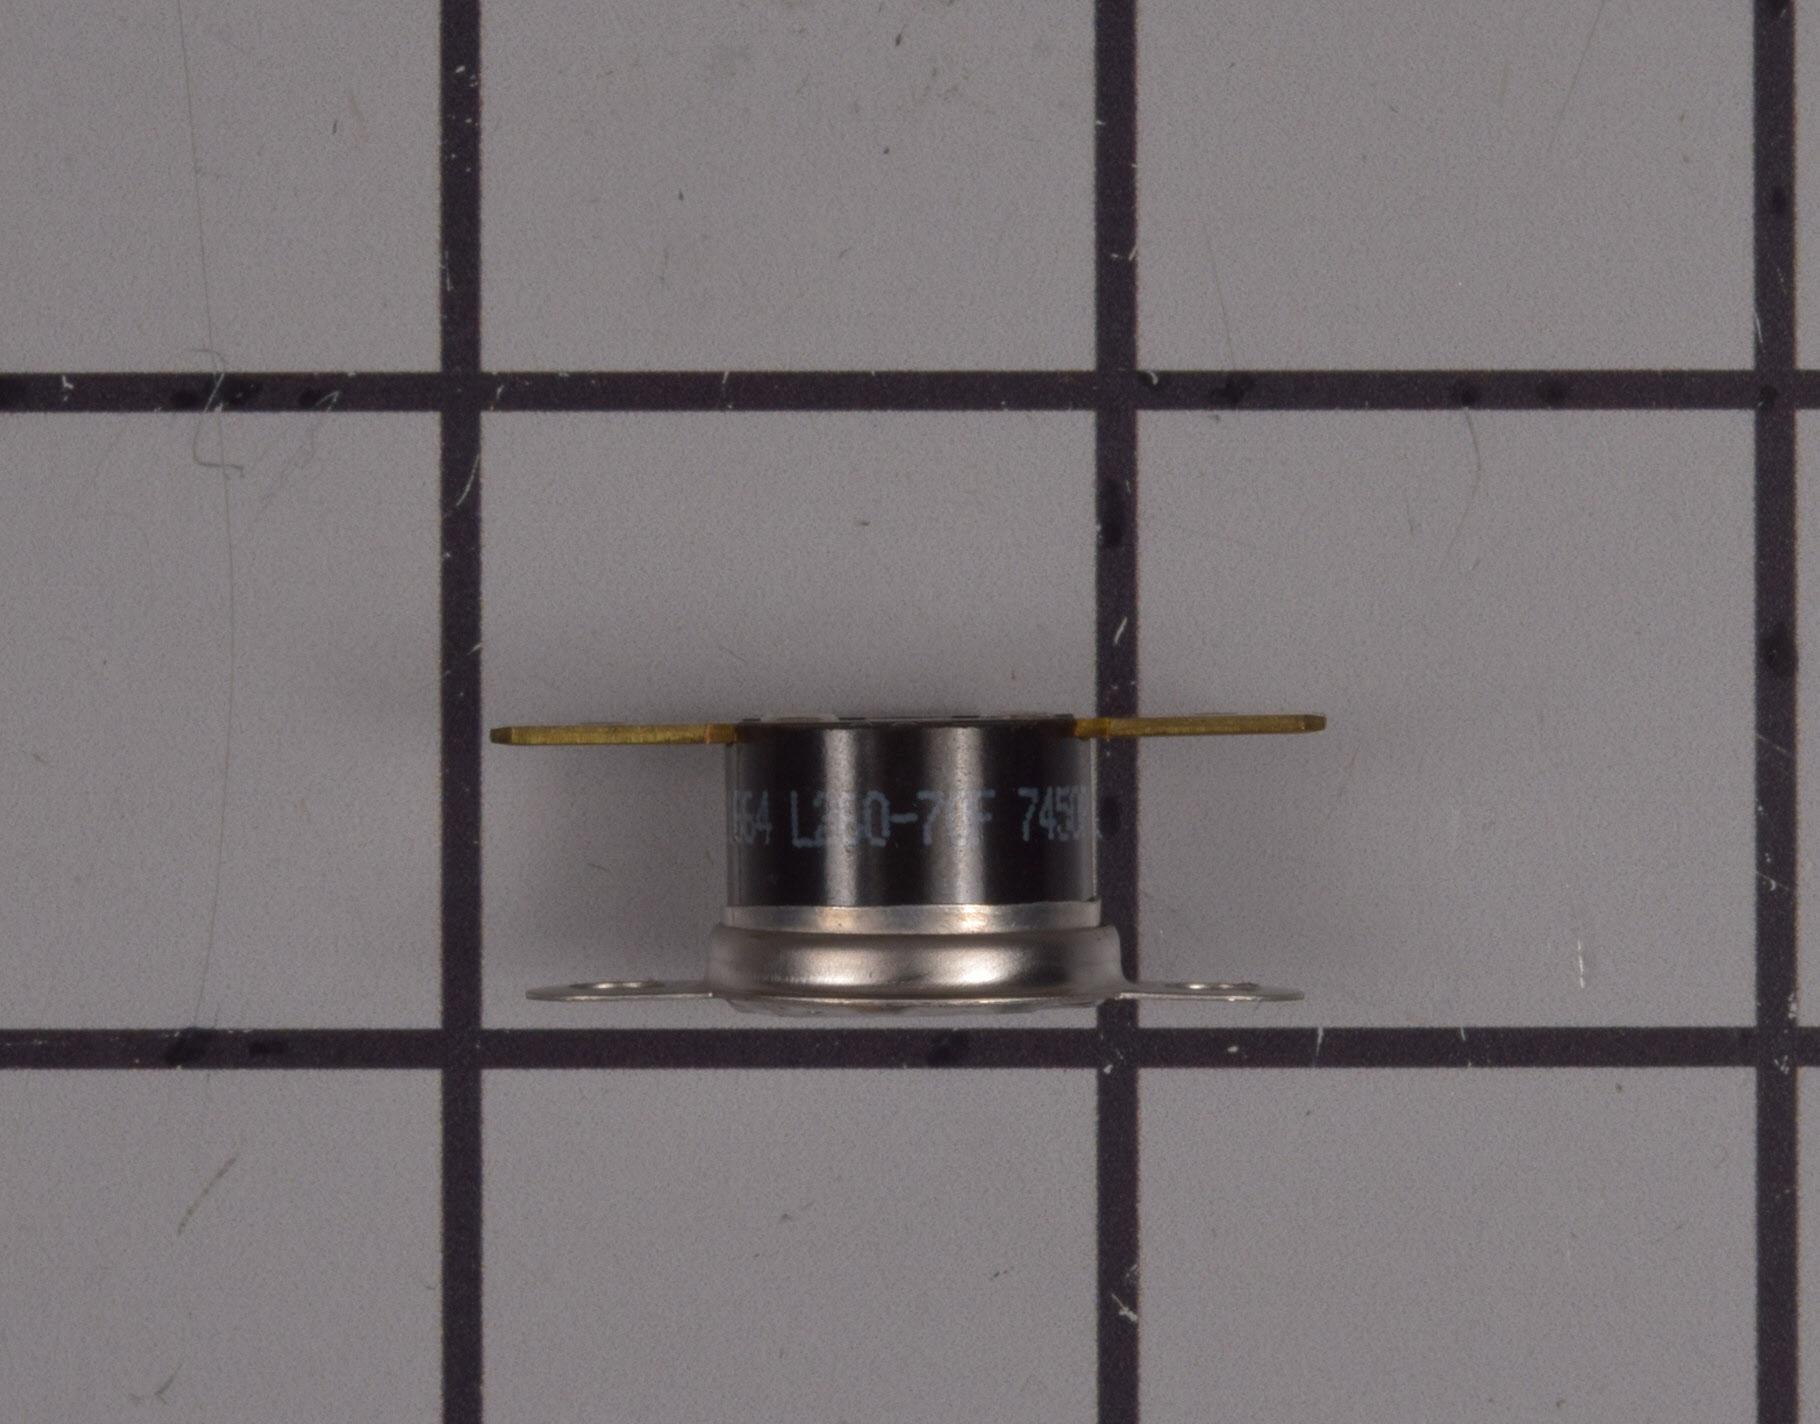 Kenmore Dishwasher Part # 74010904 - Limit Switch